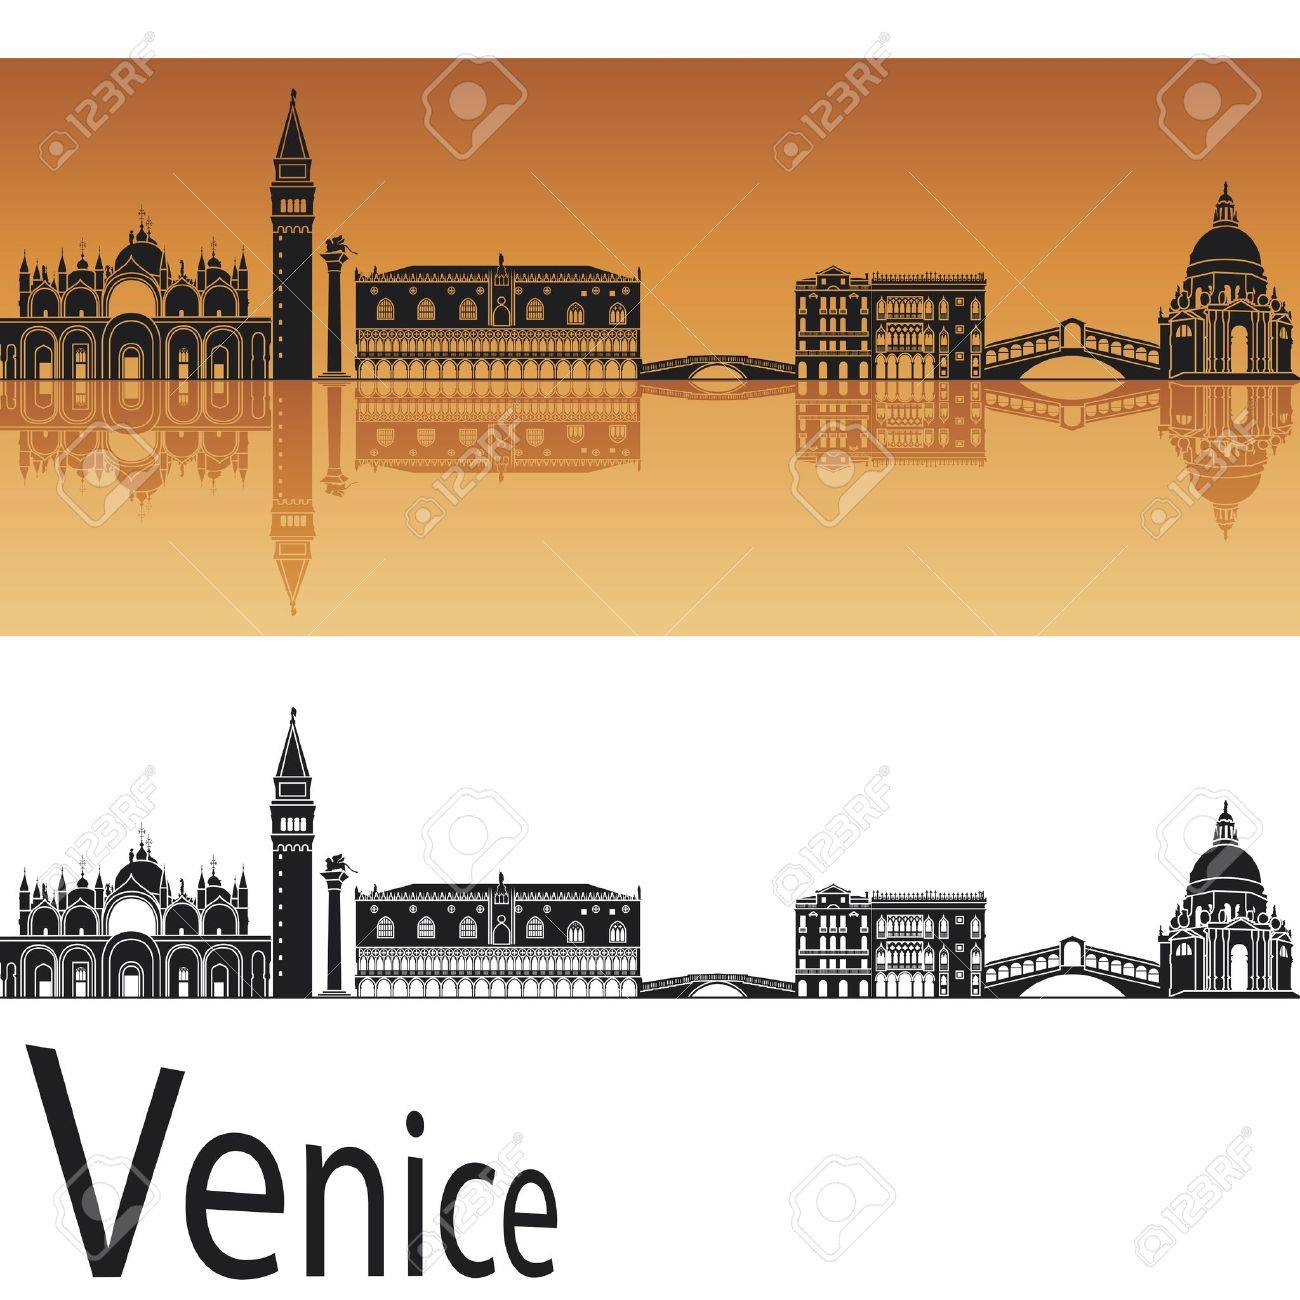 Venice skyline in orange background in editable vector file Stock Vector - 15021898